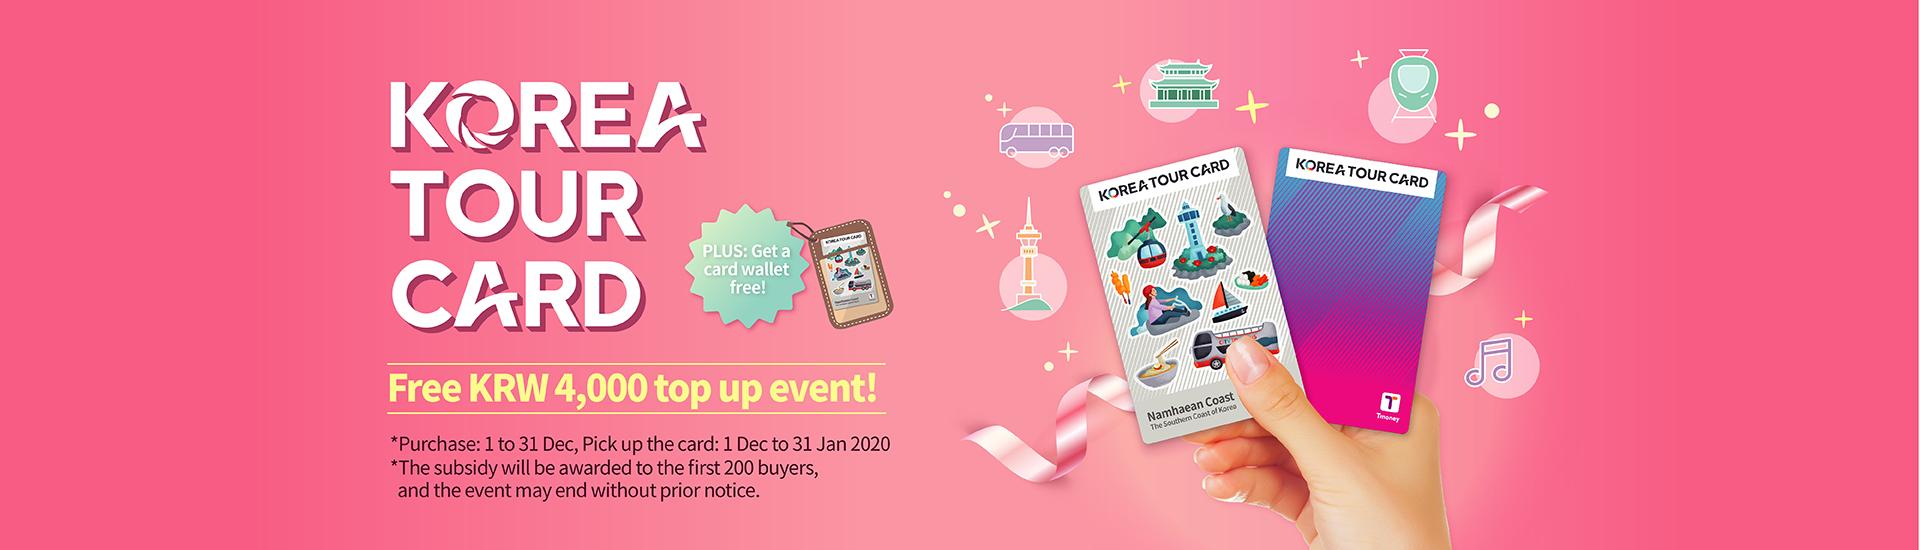 KOREA TOUR CARD Free top up event